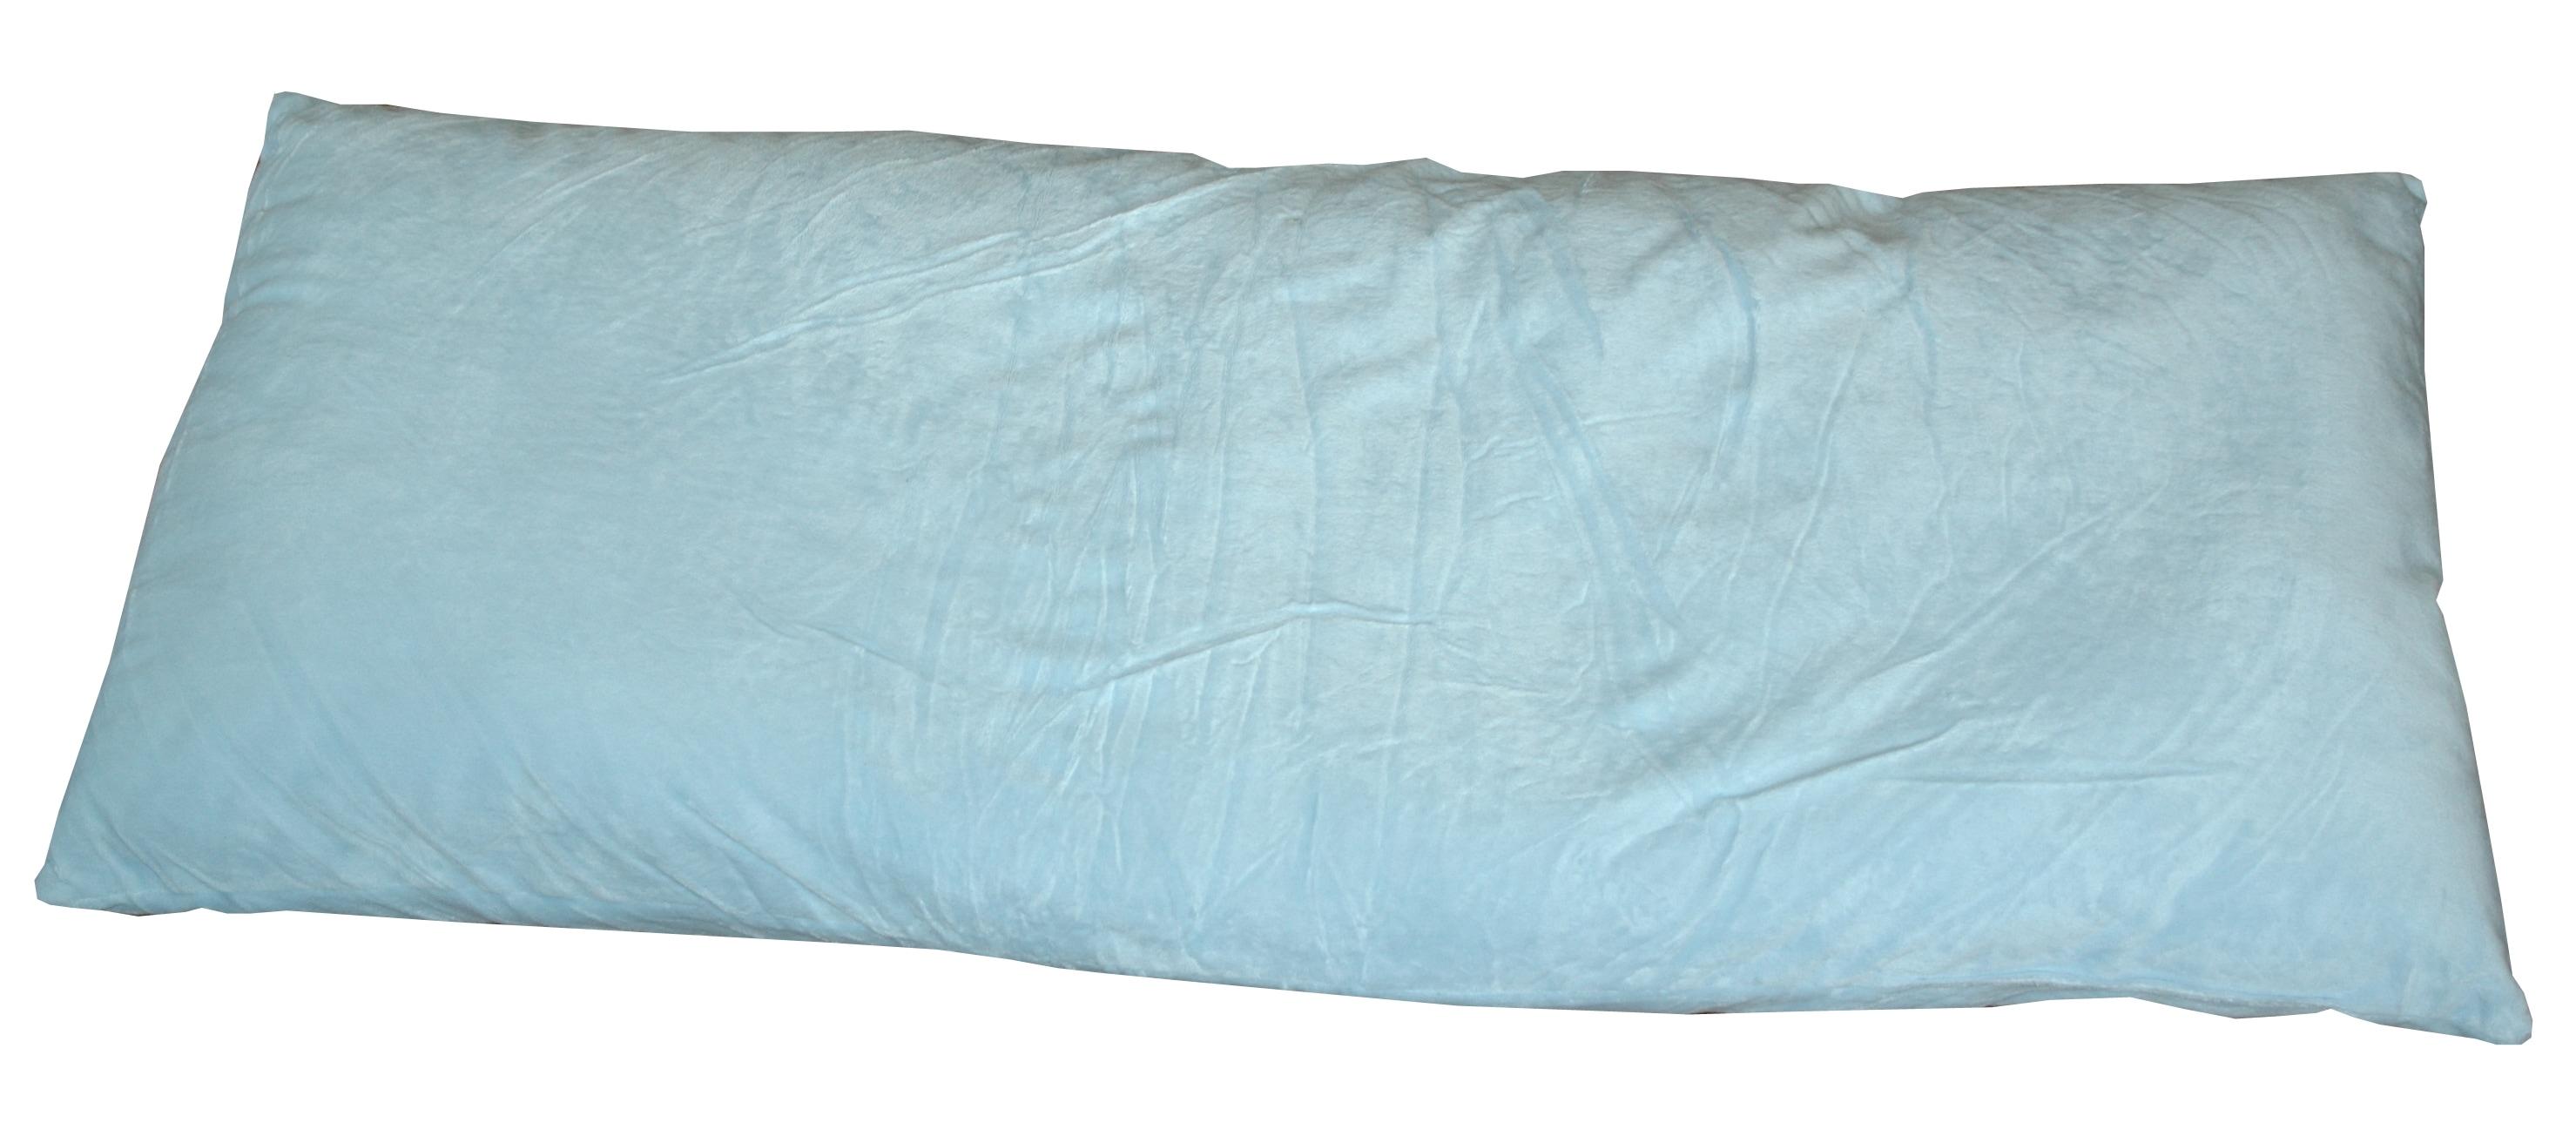 Plush Velour Body Pillow - Thumbnail 1